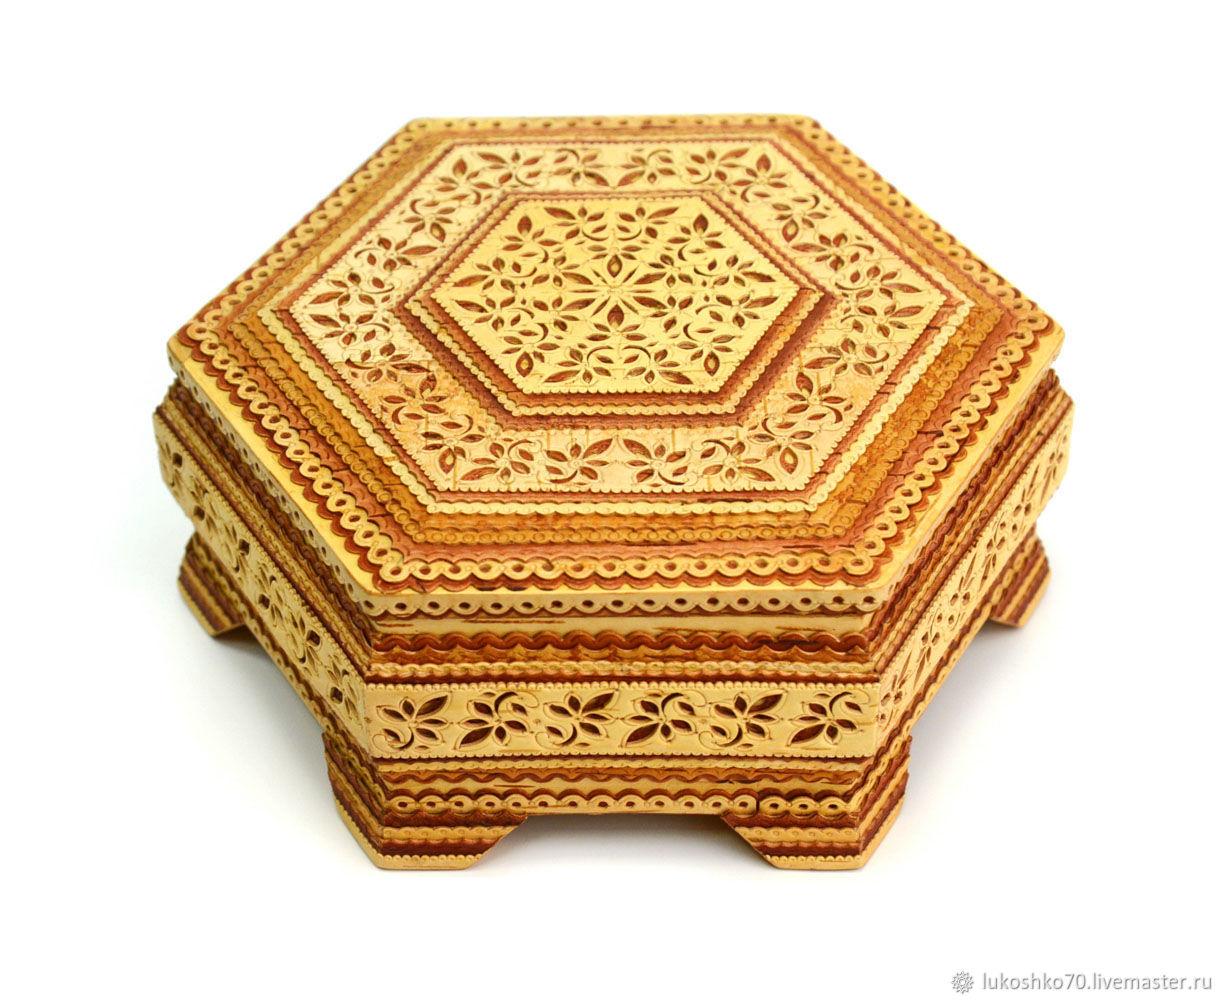 Box birch bark mirror. wooden box, Box, Tomsk,  Фото №1